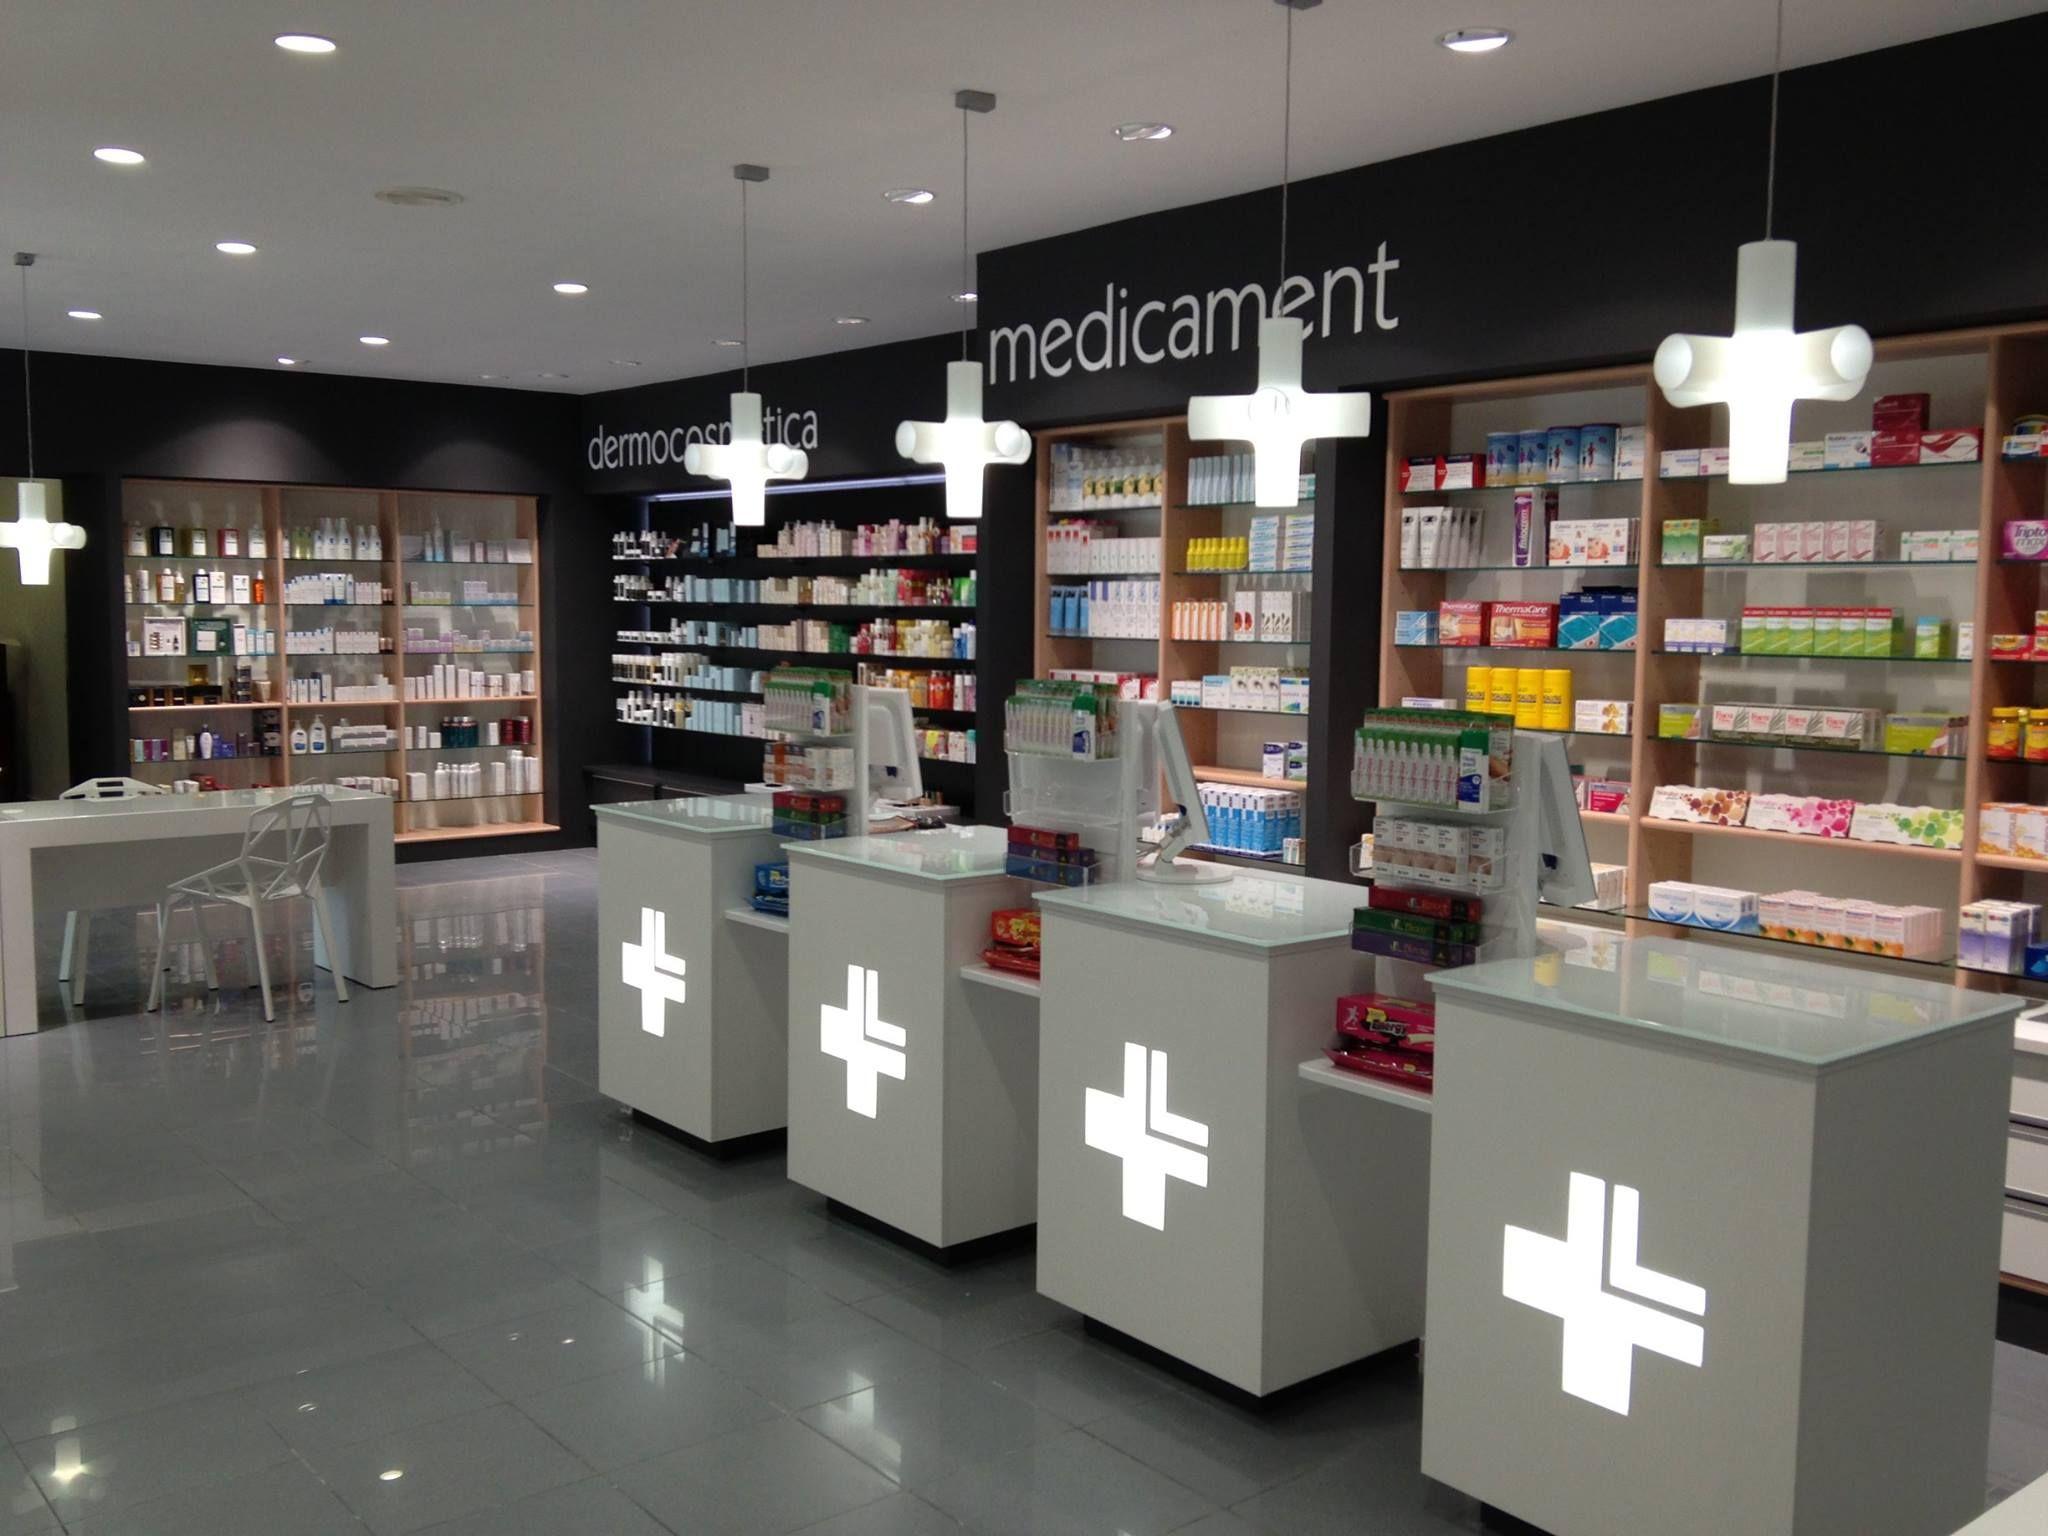 separación muebles | store ideas | Pinterest | Pharmacy, Pharmacy ...